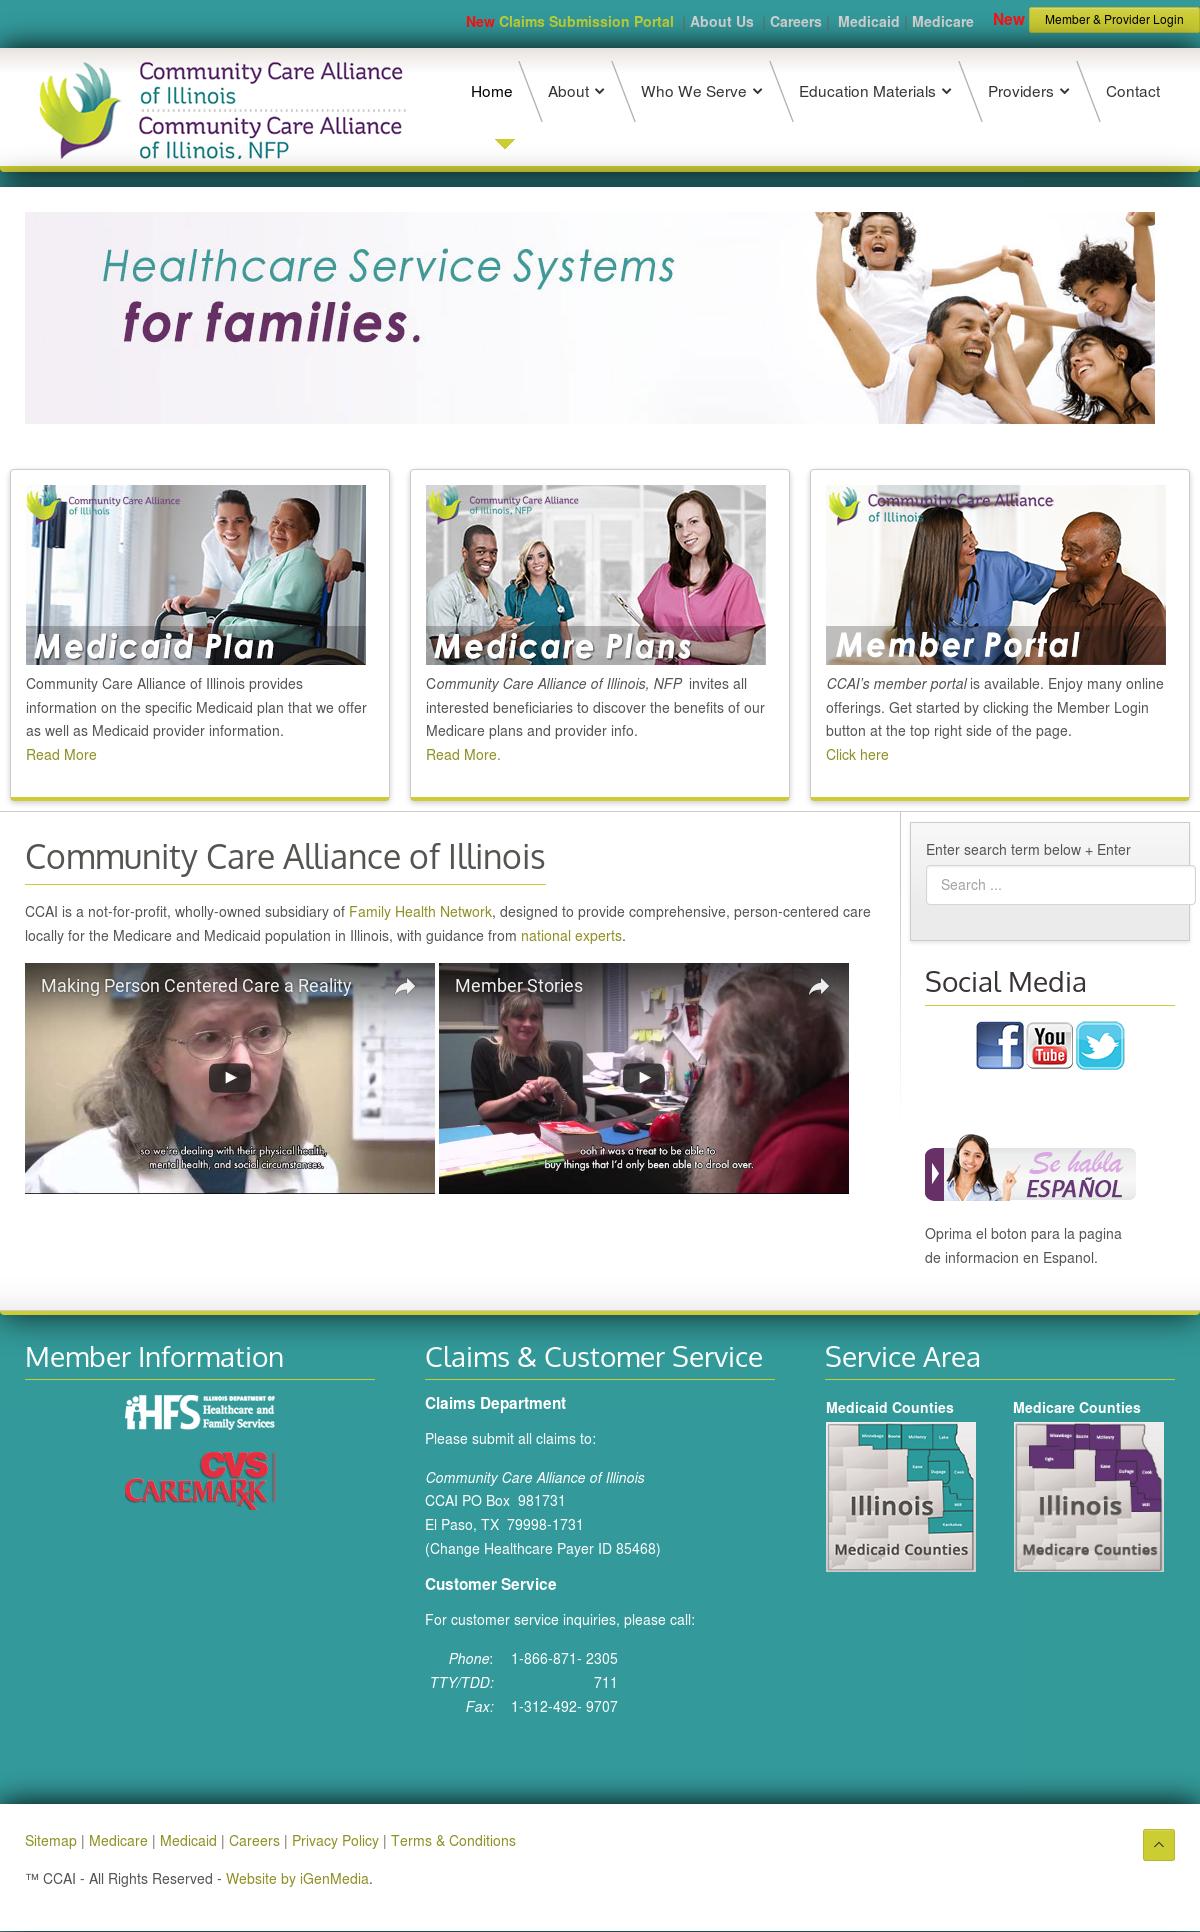 Community Care Alliance Of Illinois Competitors, Revenue and